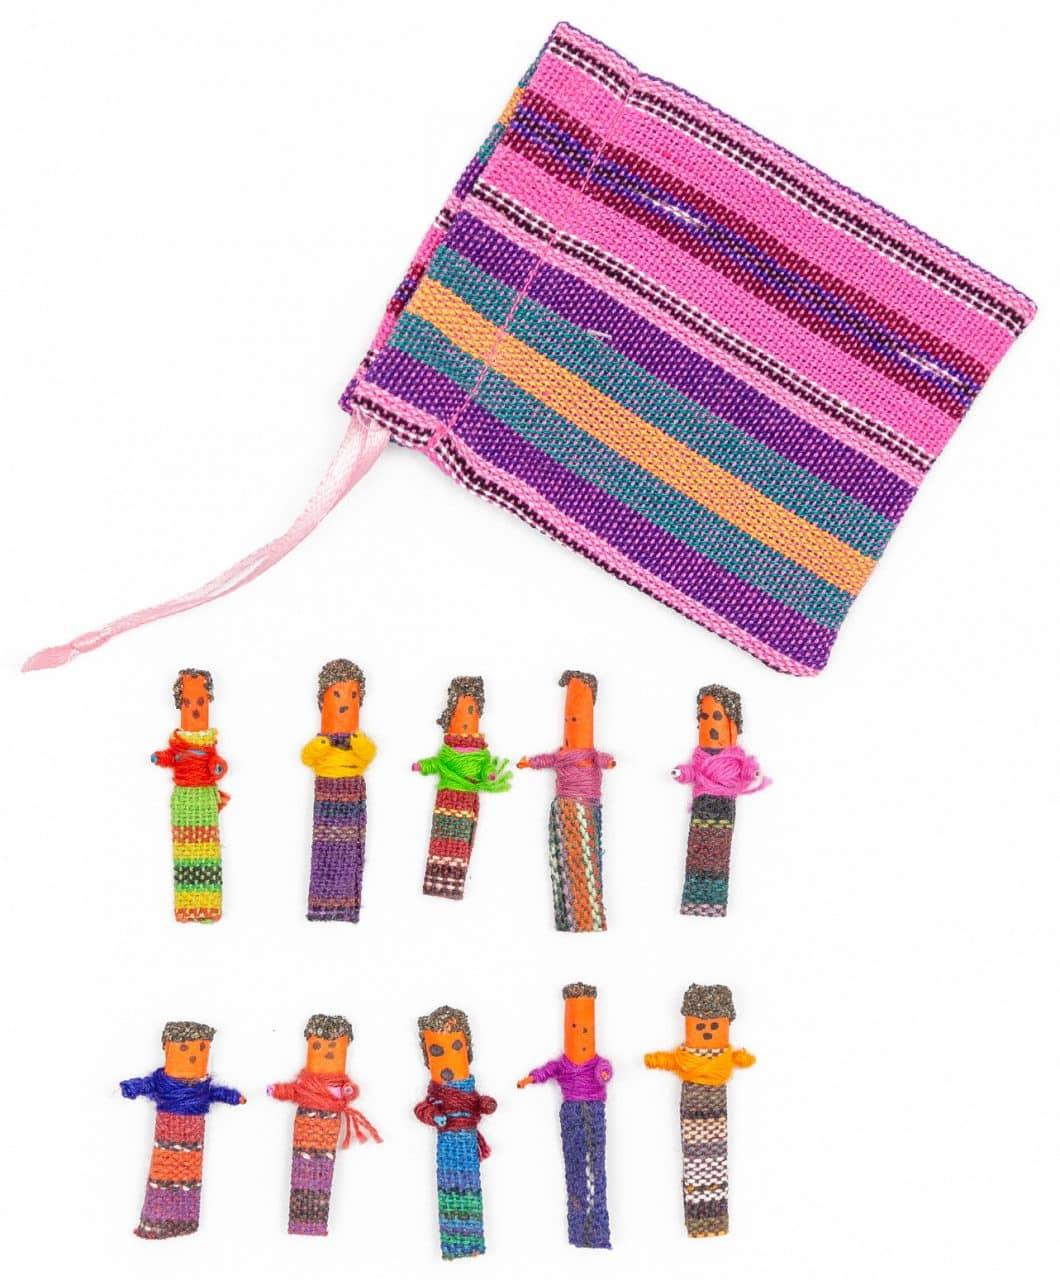 Guatemalan Worry Dolls - Set of 10 Small